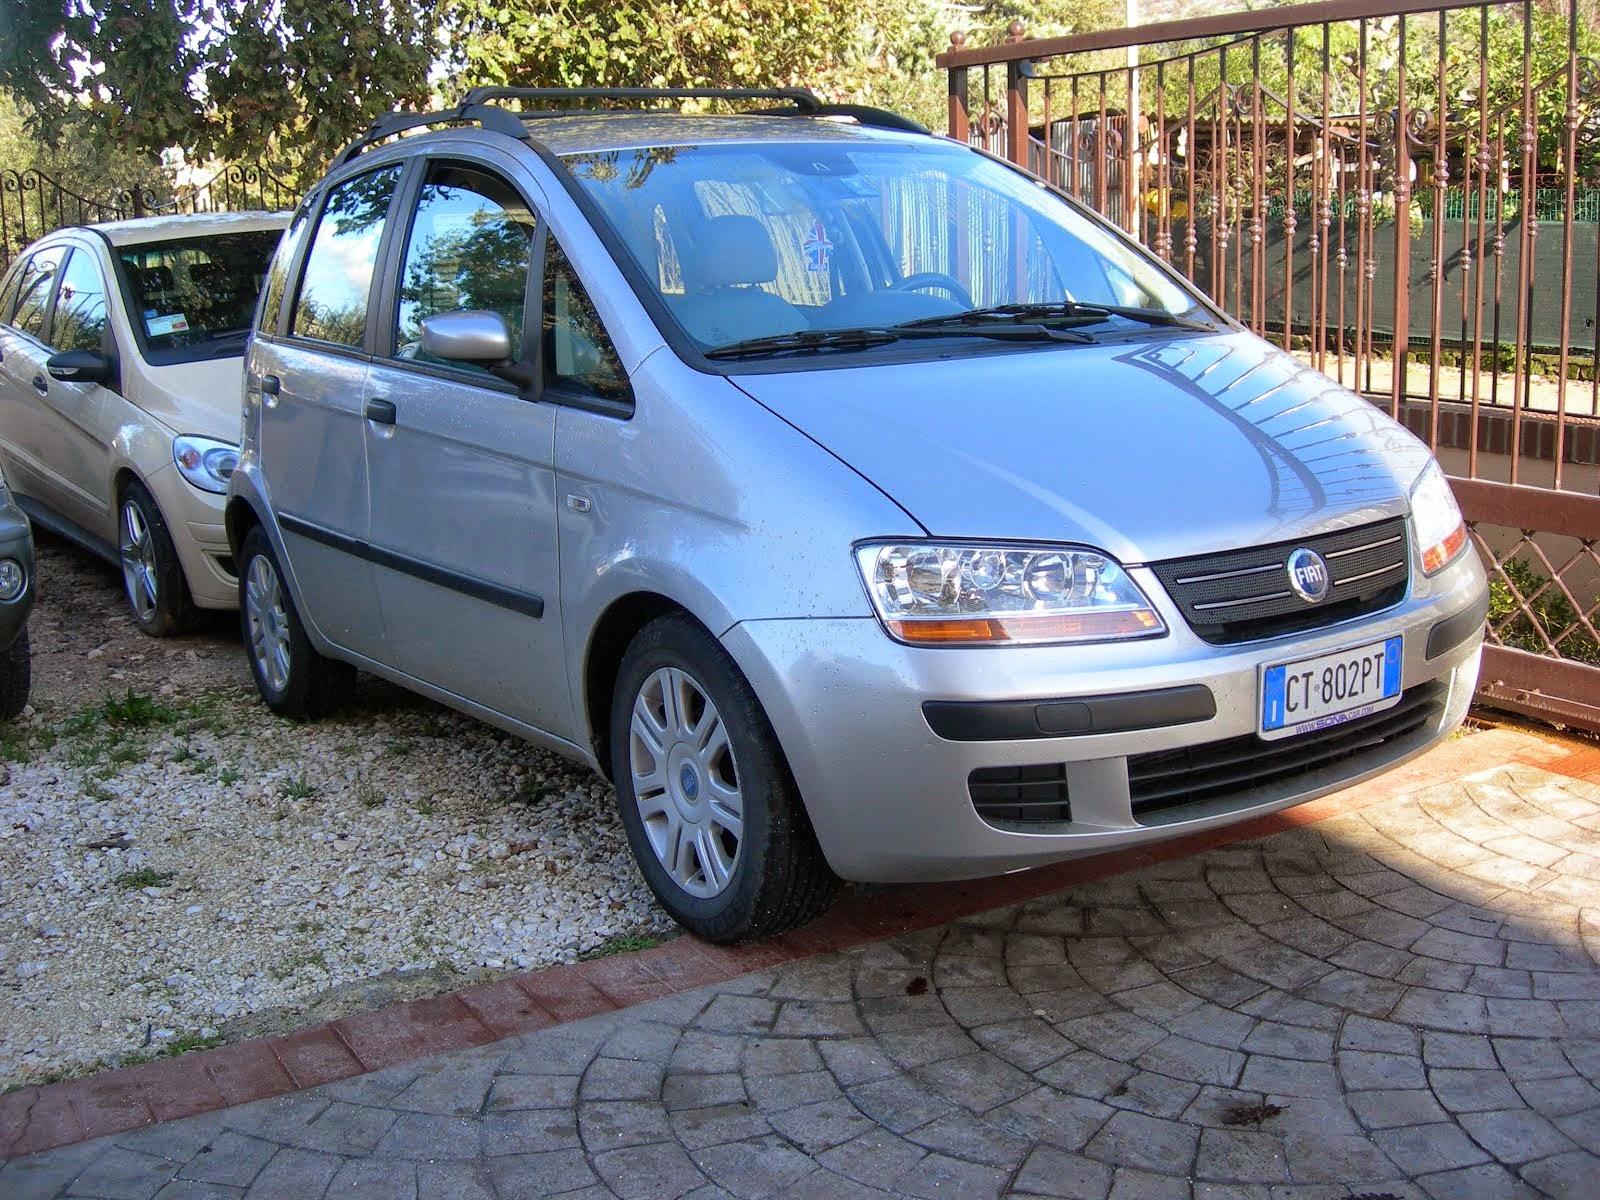 Fiat Idea 1.3 Multijet 75 CV Anno 2005